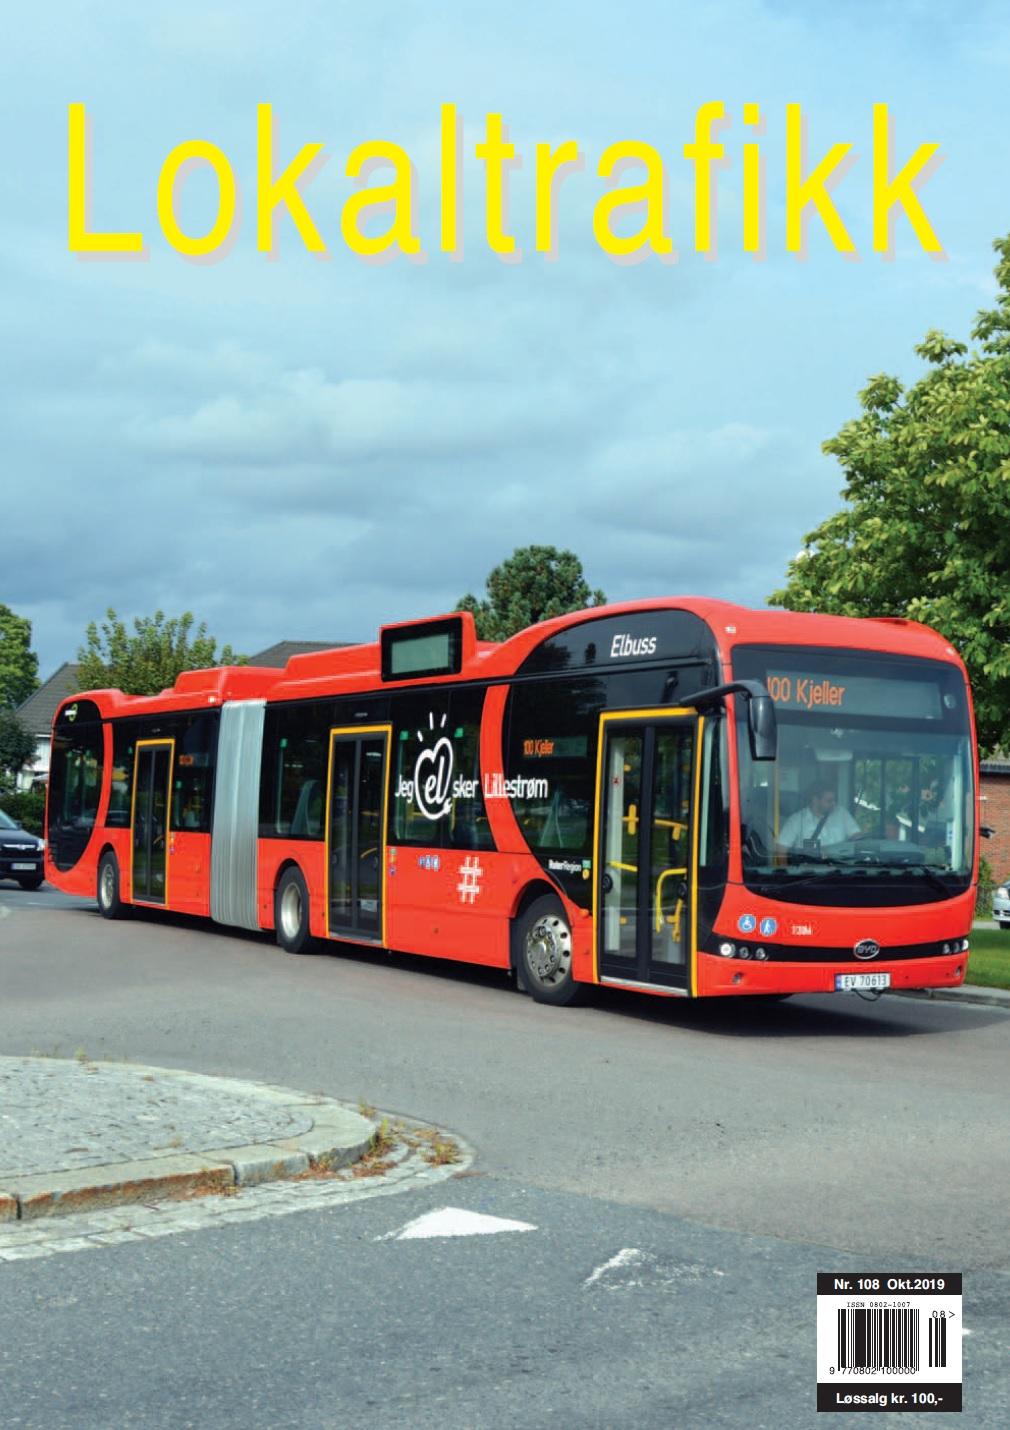 Lokaltrafikk #108